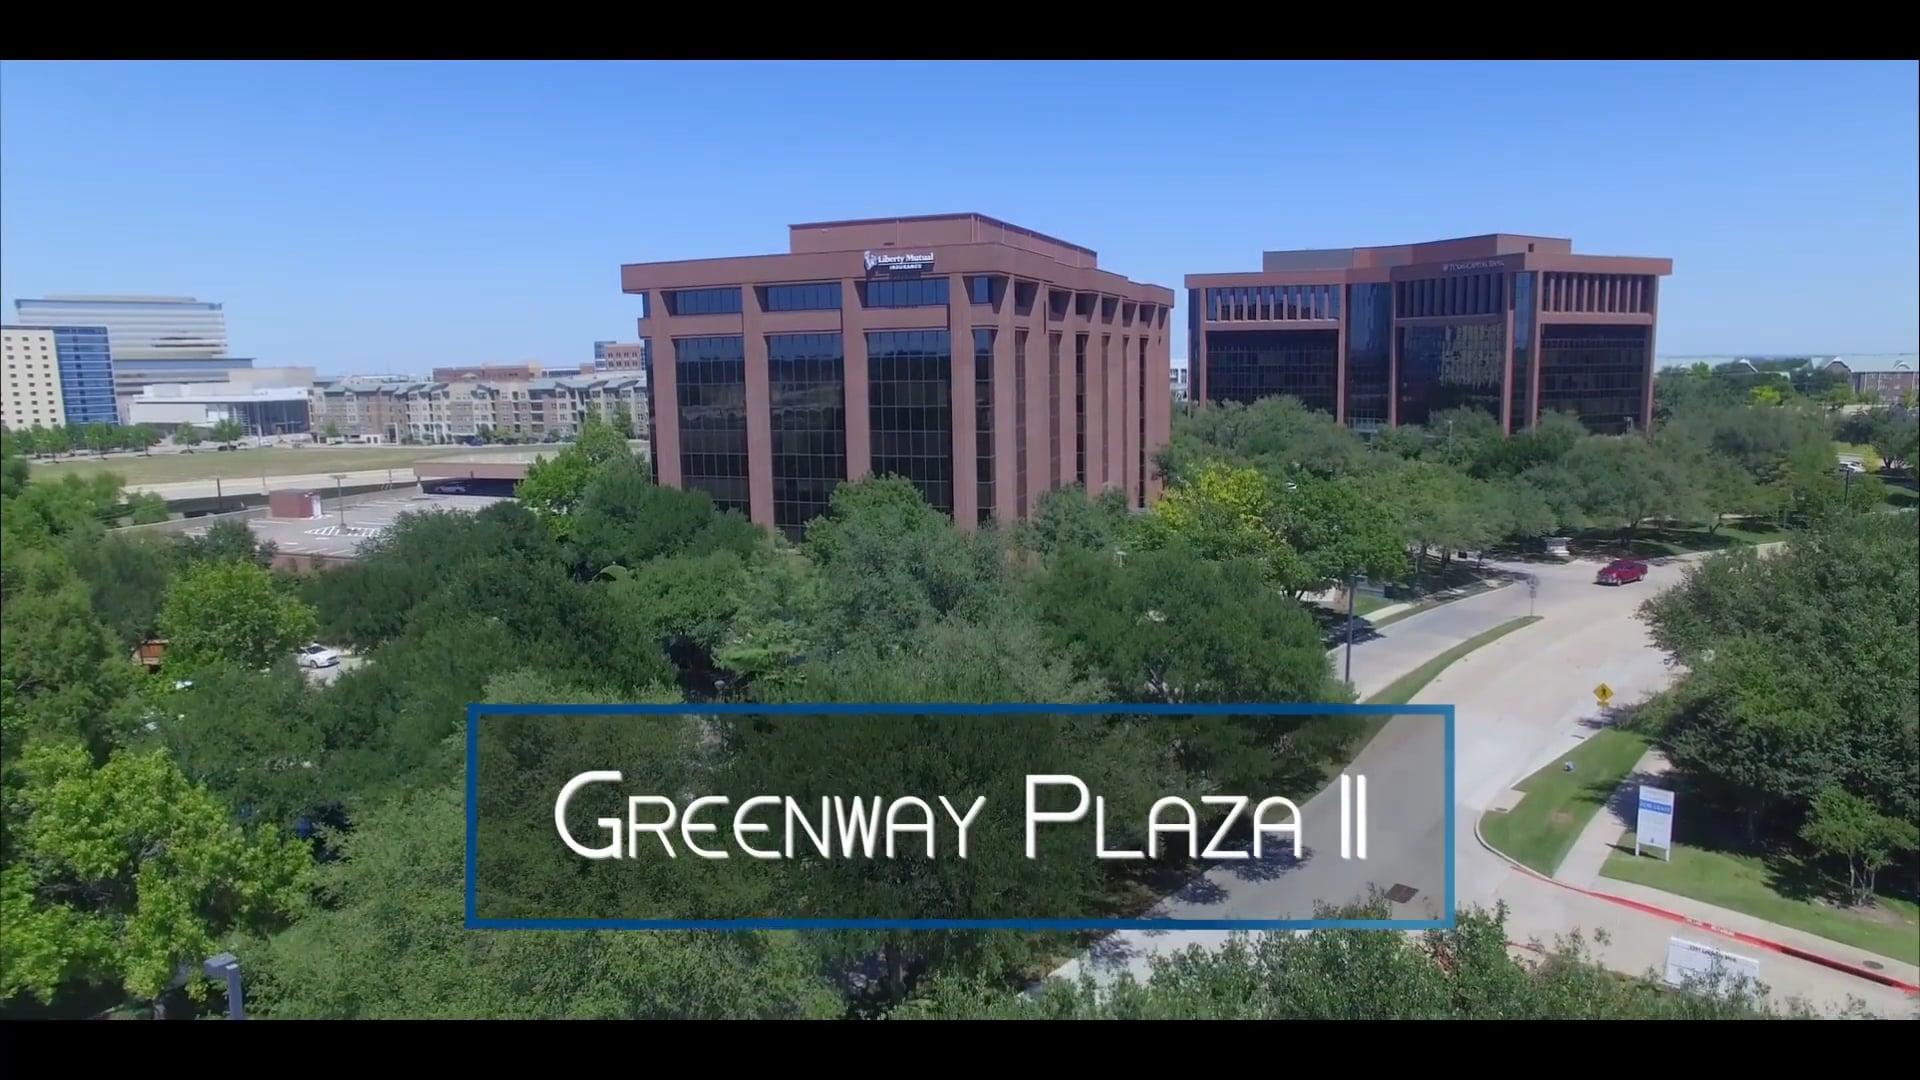 TM - Greenway Plaza II